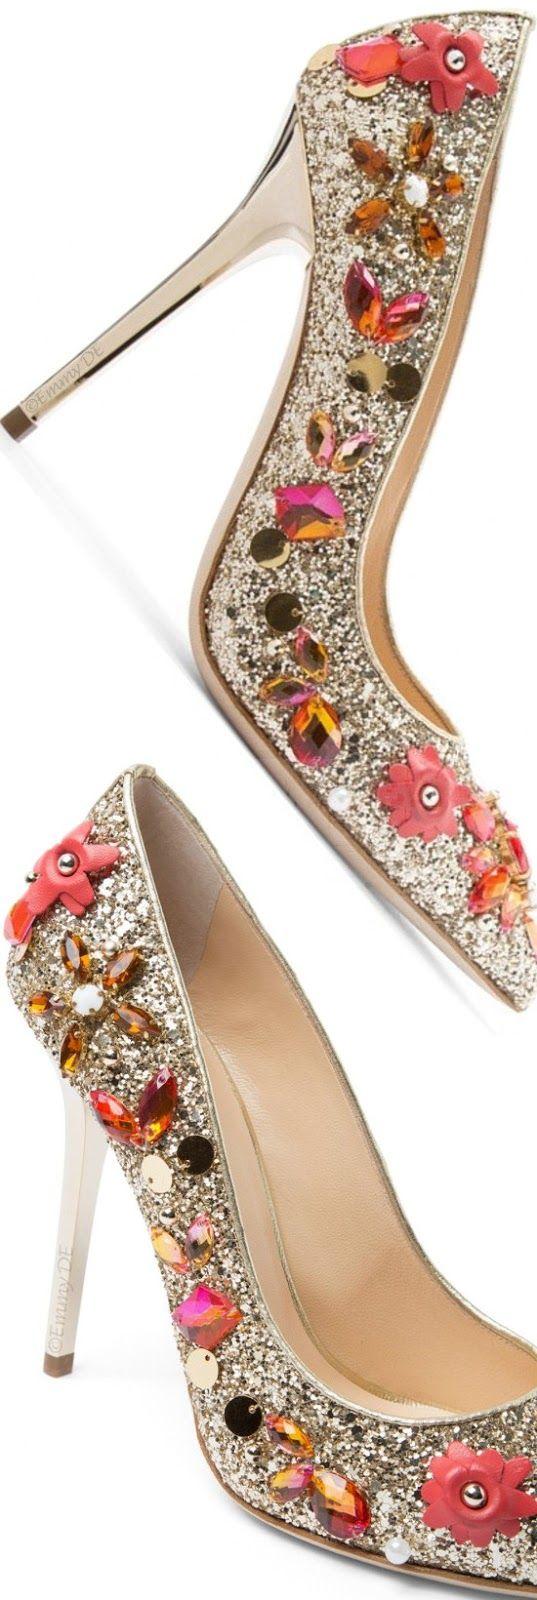 Brilliant Luxury by Emmy DE ♦Ballin 'Iris Red' Pumps